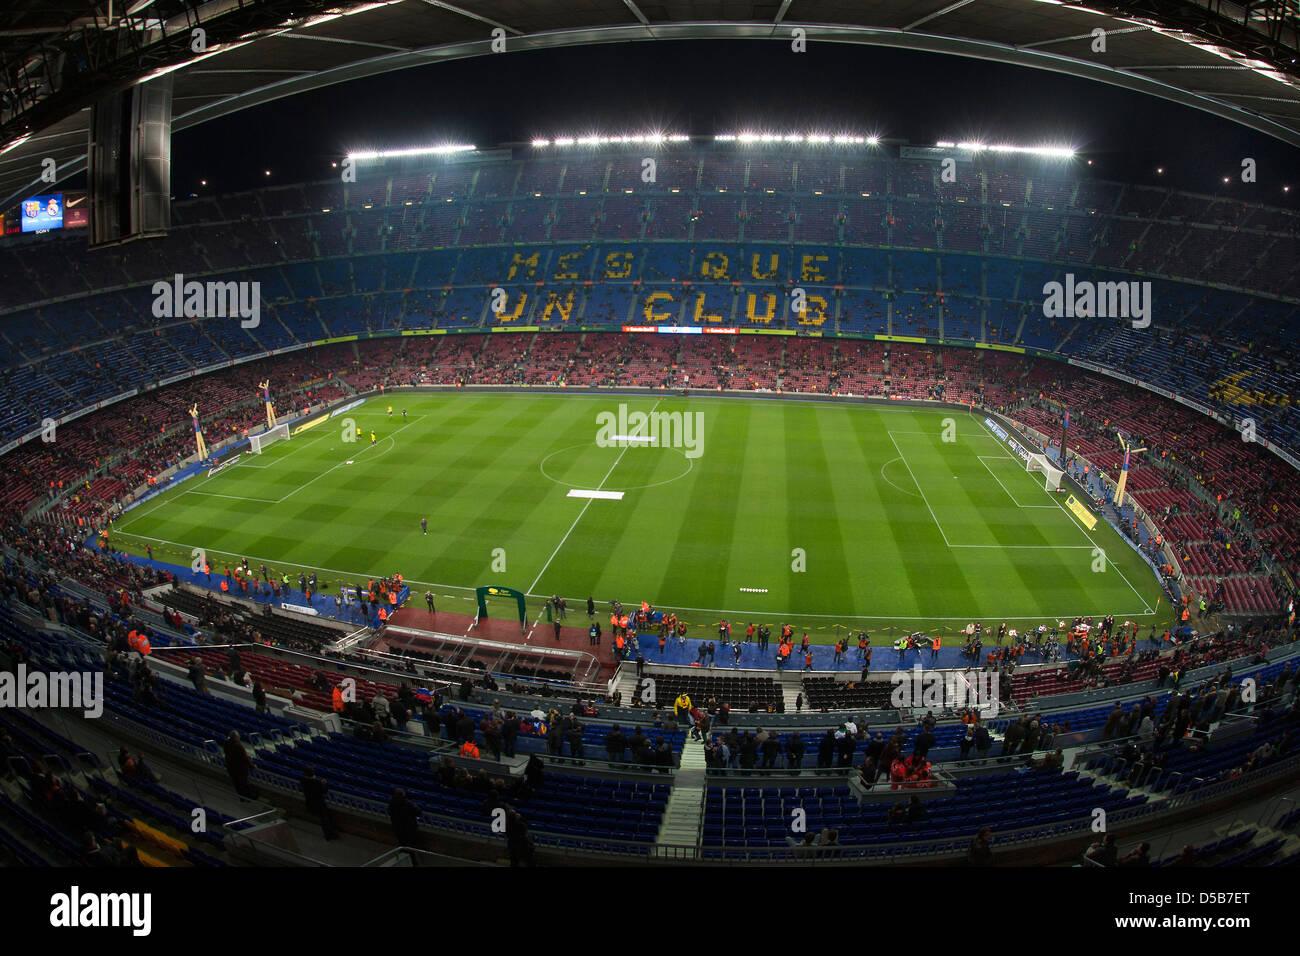 Barcelona, Spain, FC Barcelona vs Real Madrid at the Camp Nou stadium - Stock Image